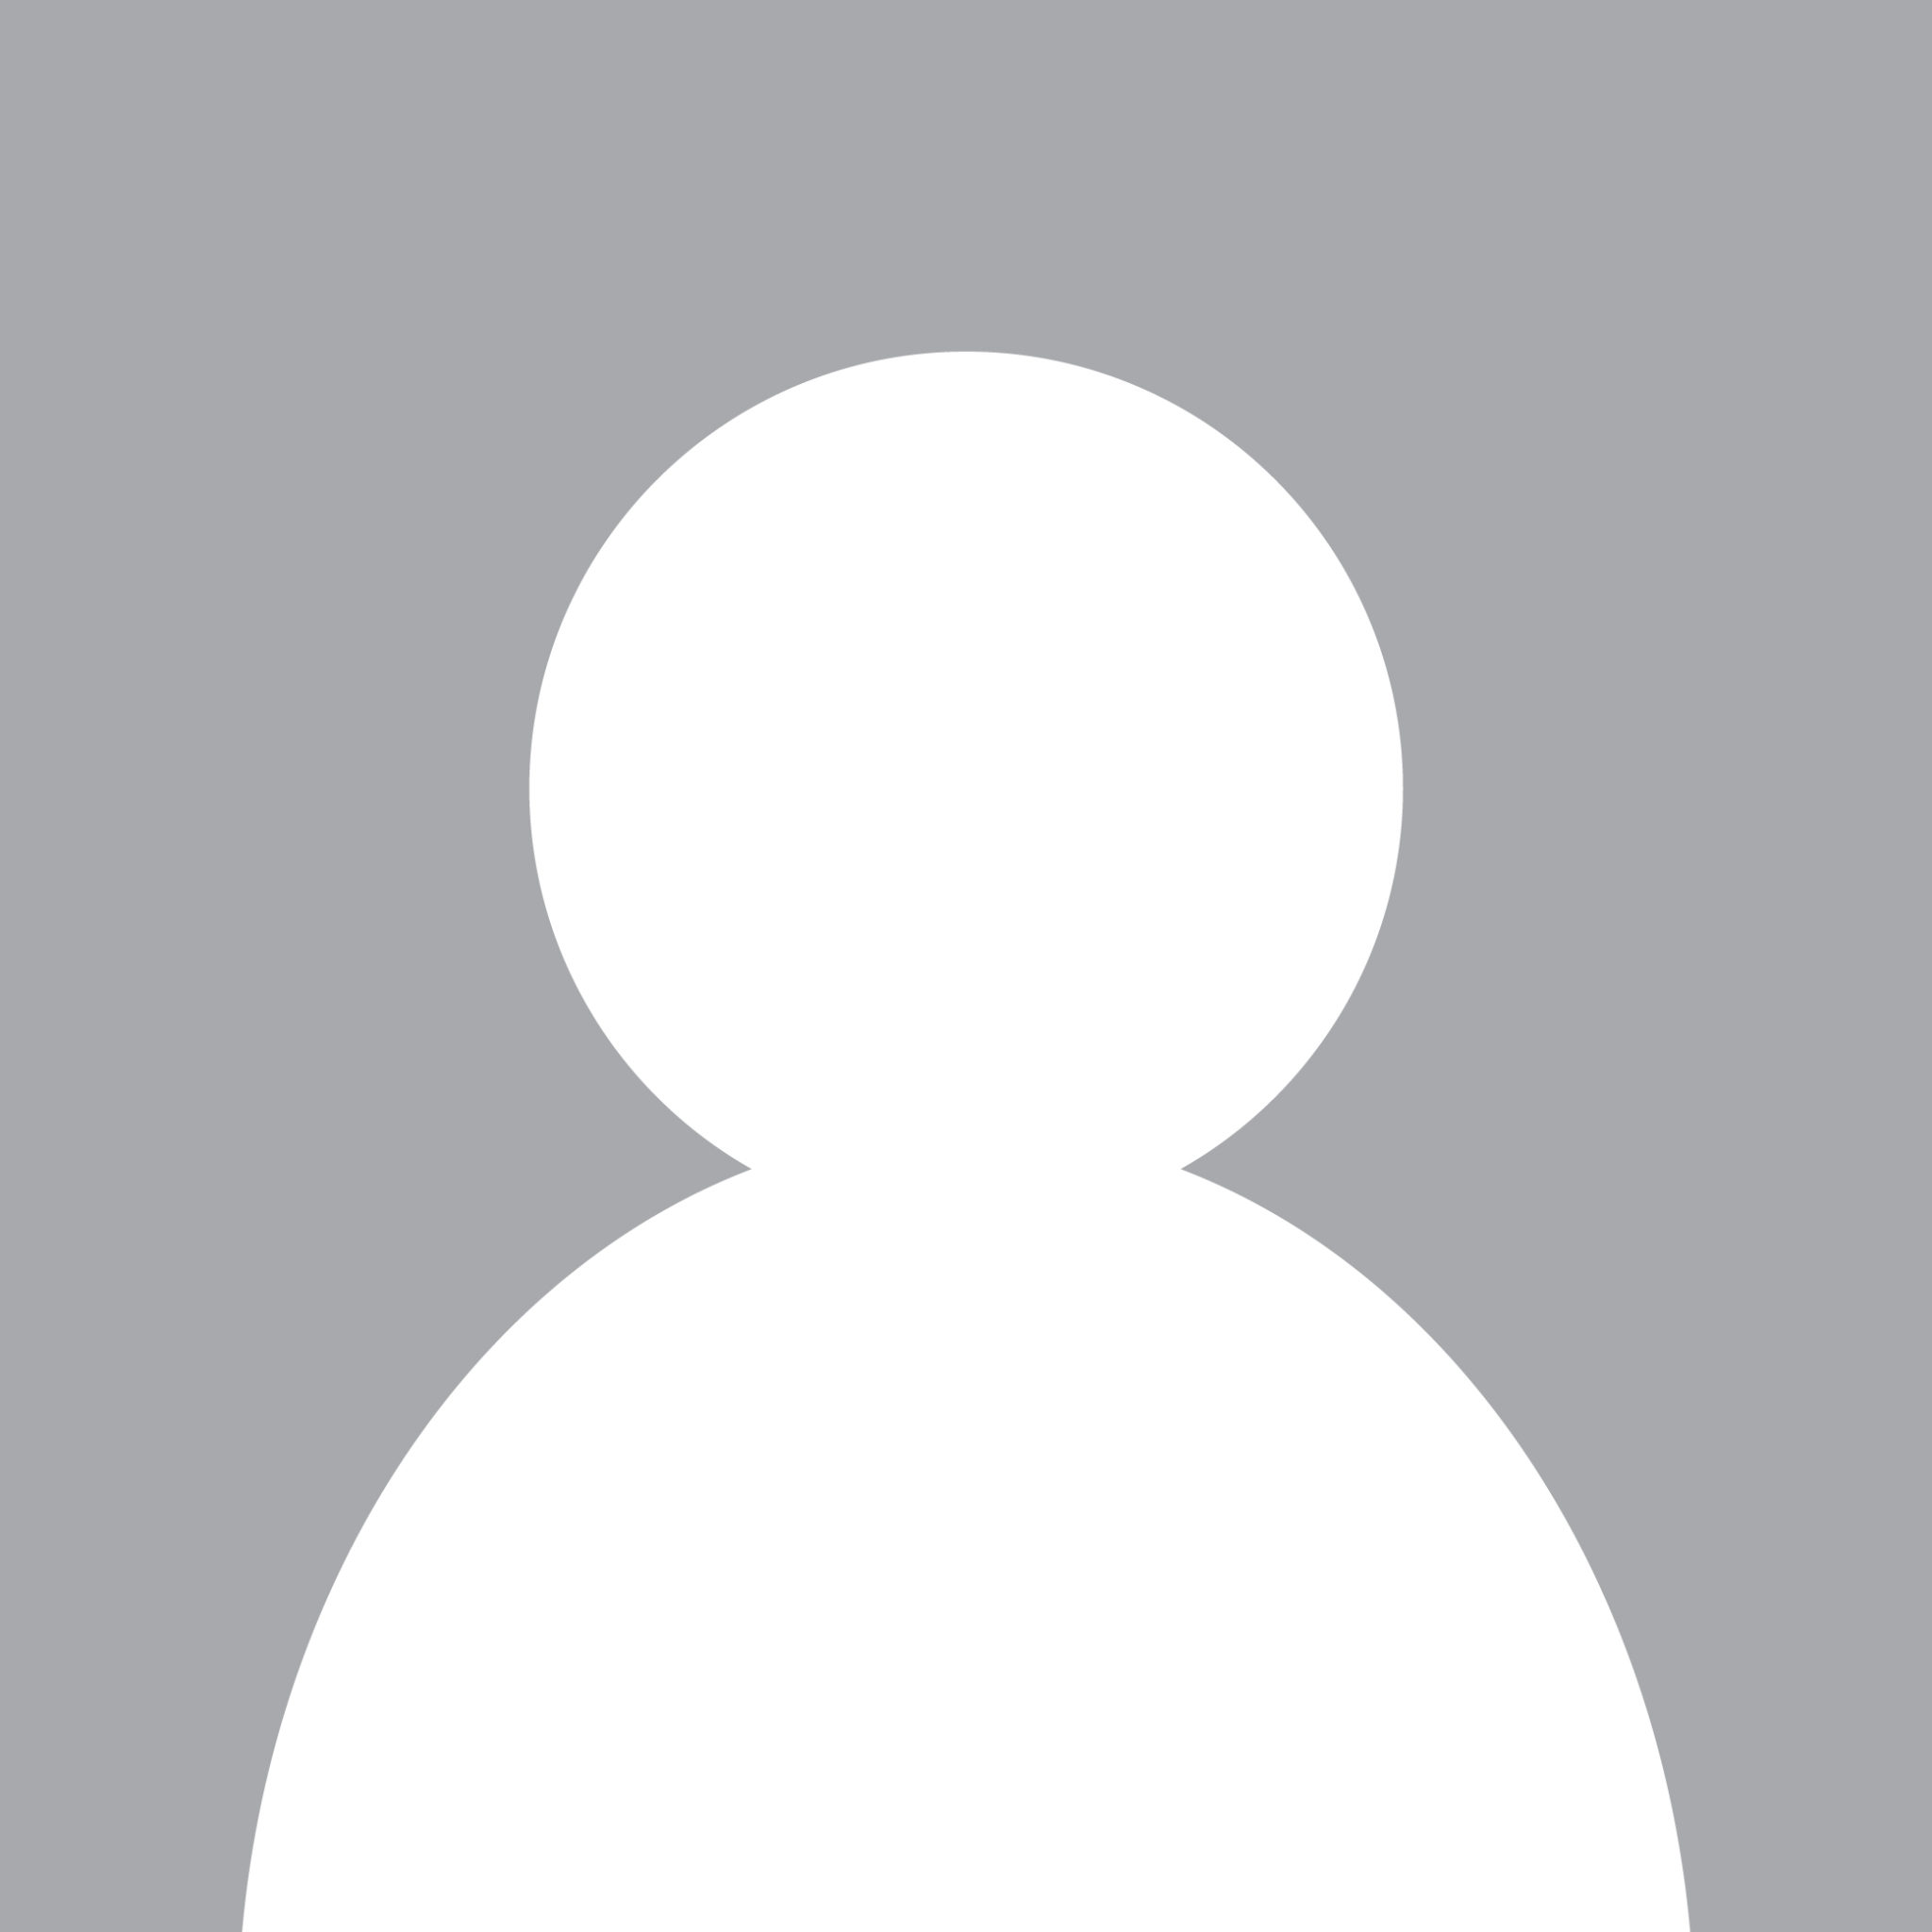 Social Media Advisory Council - Cameron Magruder